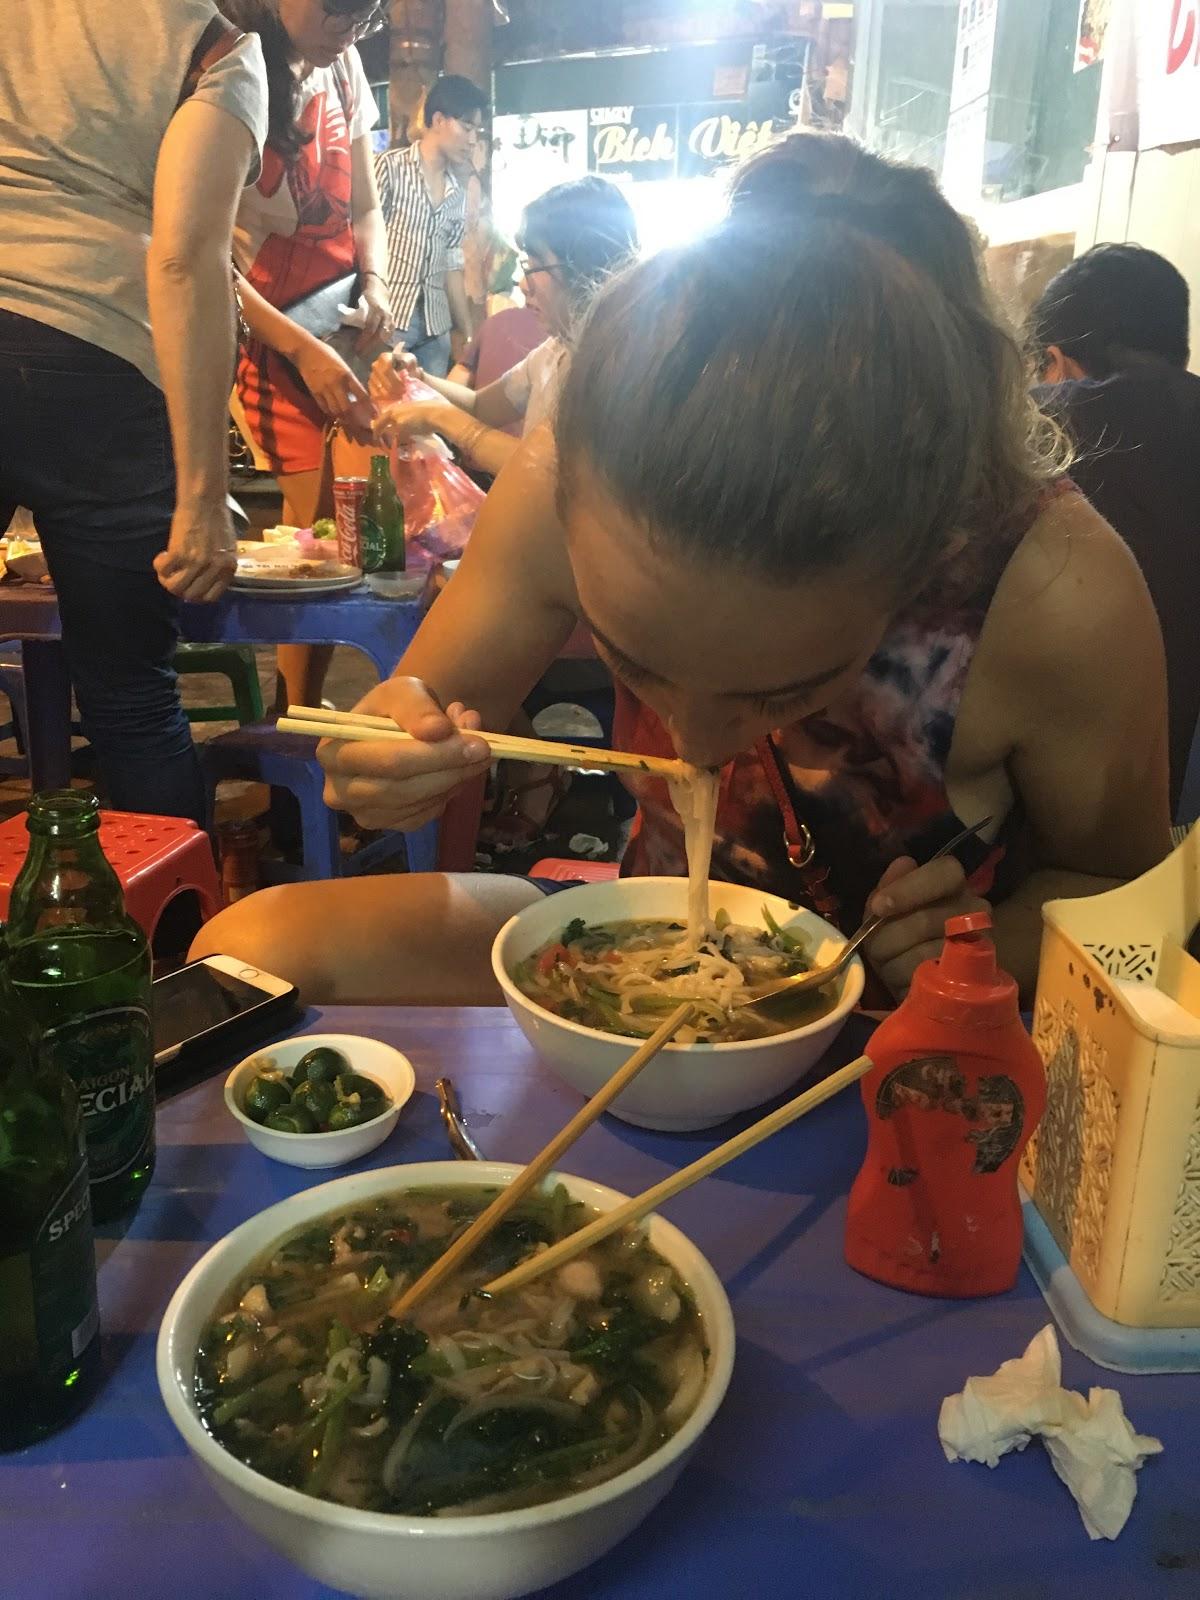 Slurping some Pho Bo (Beef noodle soup)